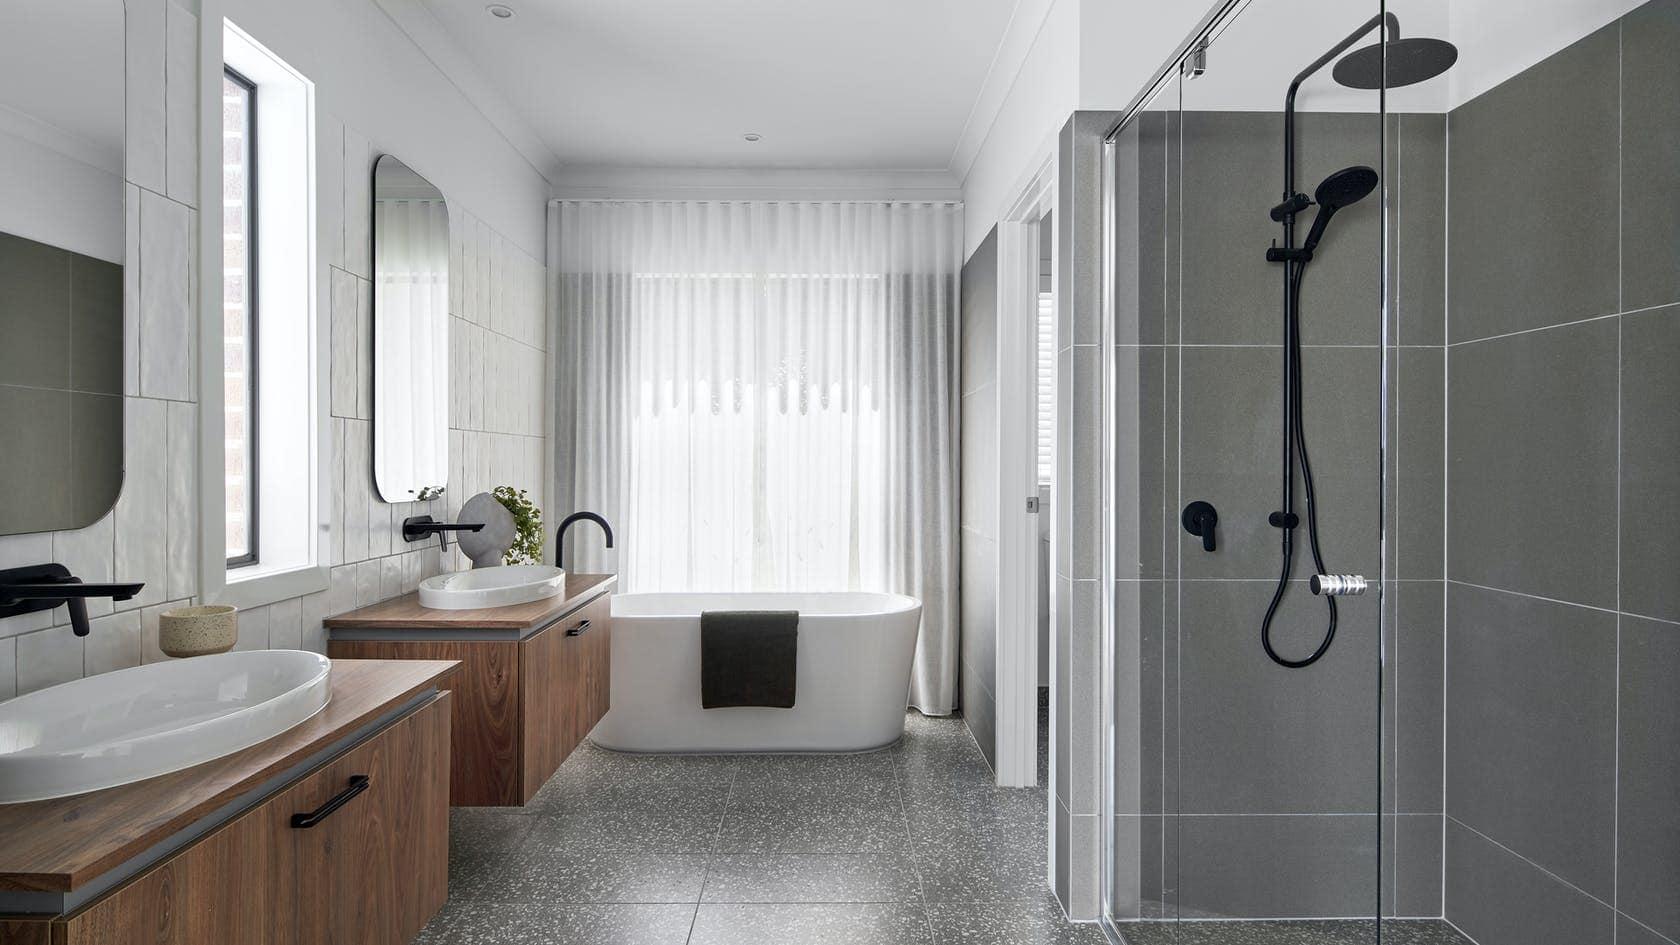 white sheer curtains on bathroom window behind freestanding bathtub